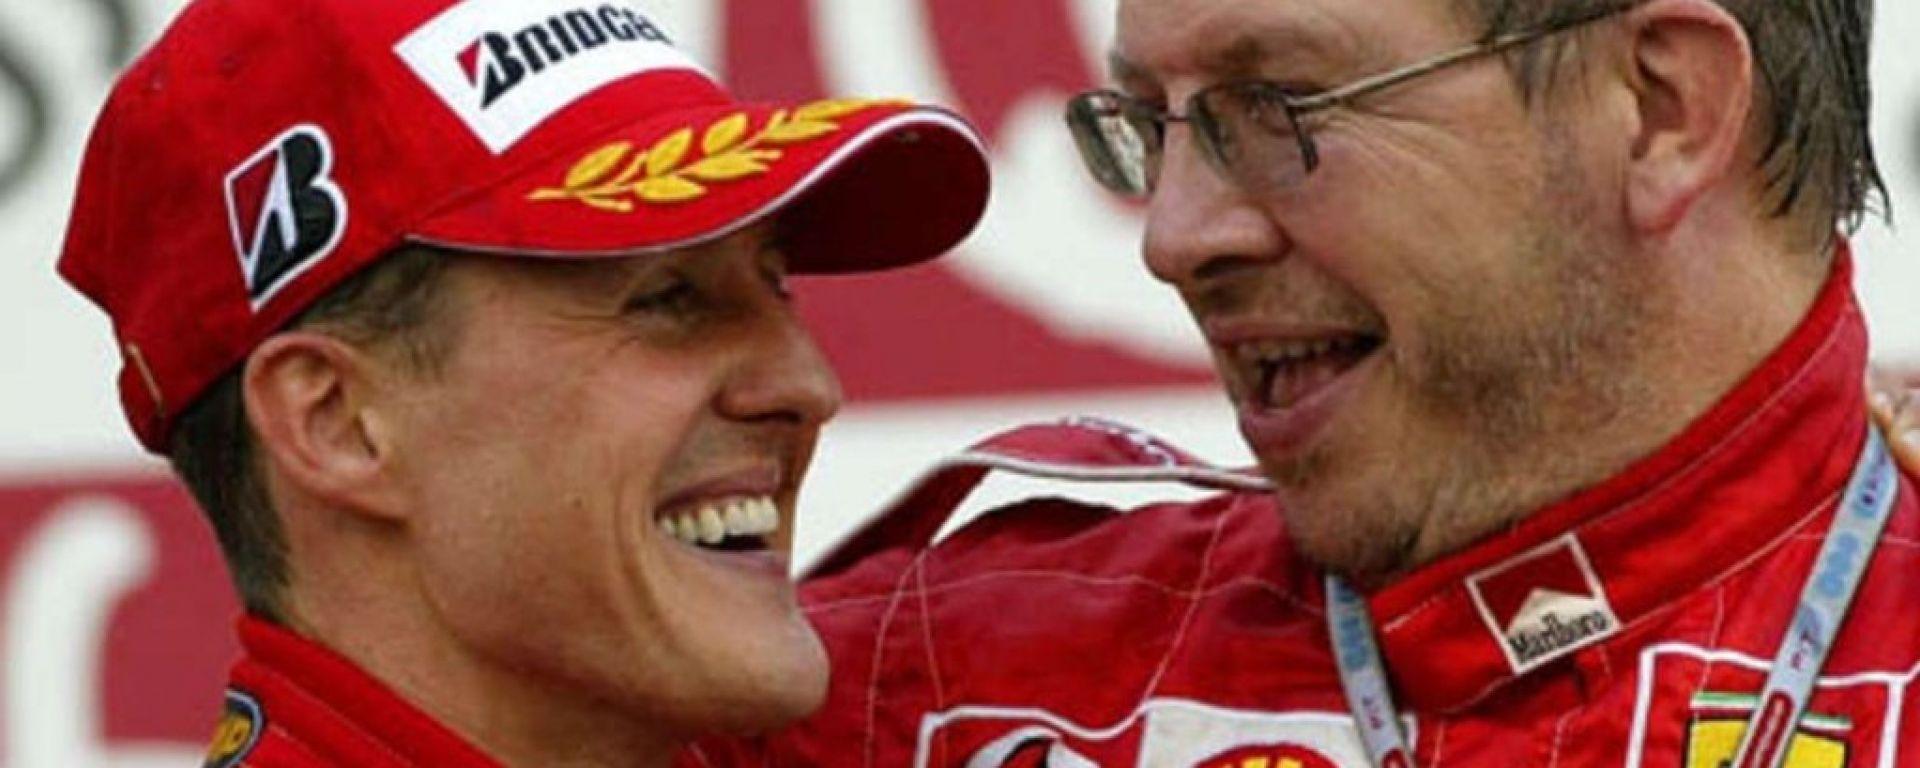 Ross Brawn: Schumacher mostra segnali incoraggianti